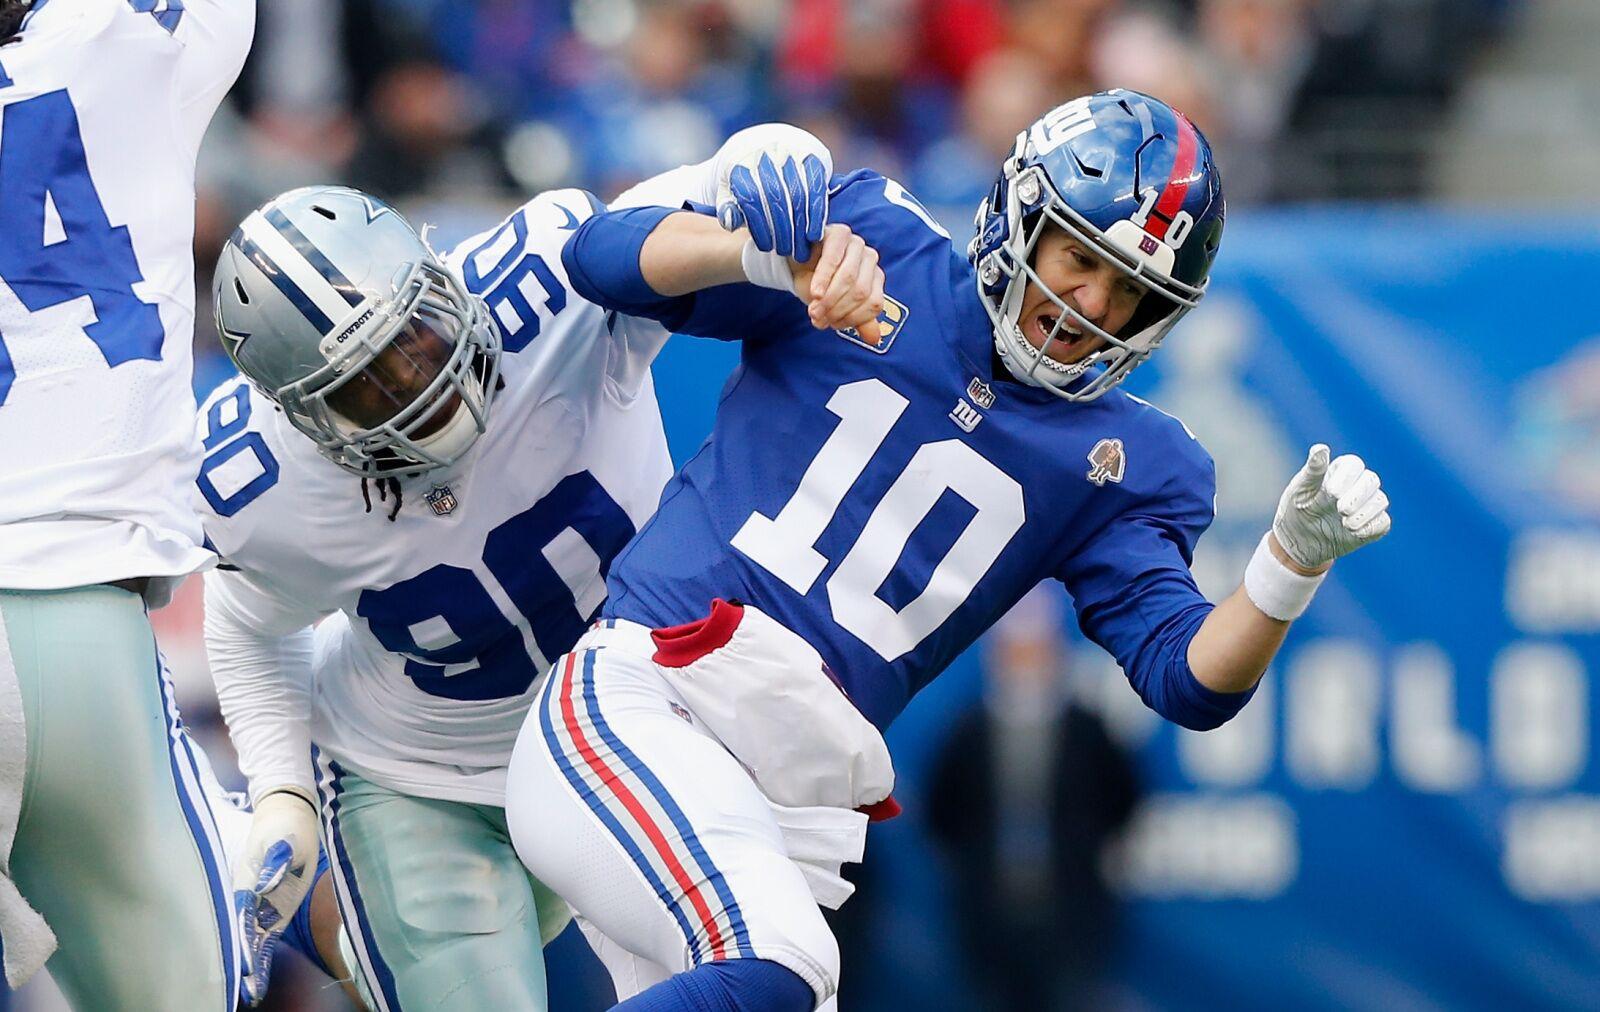 Giants could pull plug on Eli Manning before regular season begins